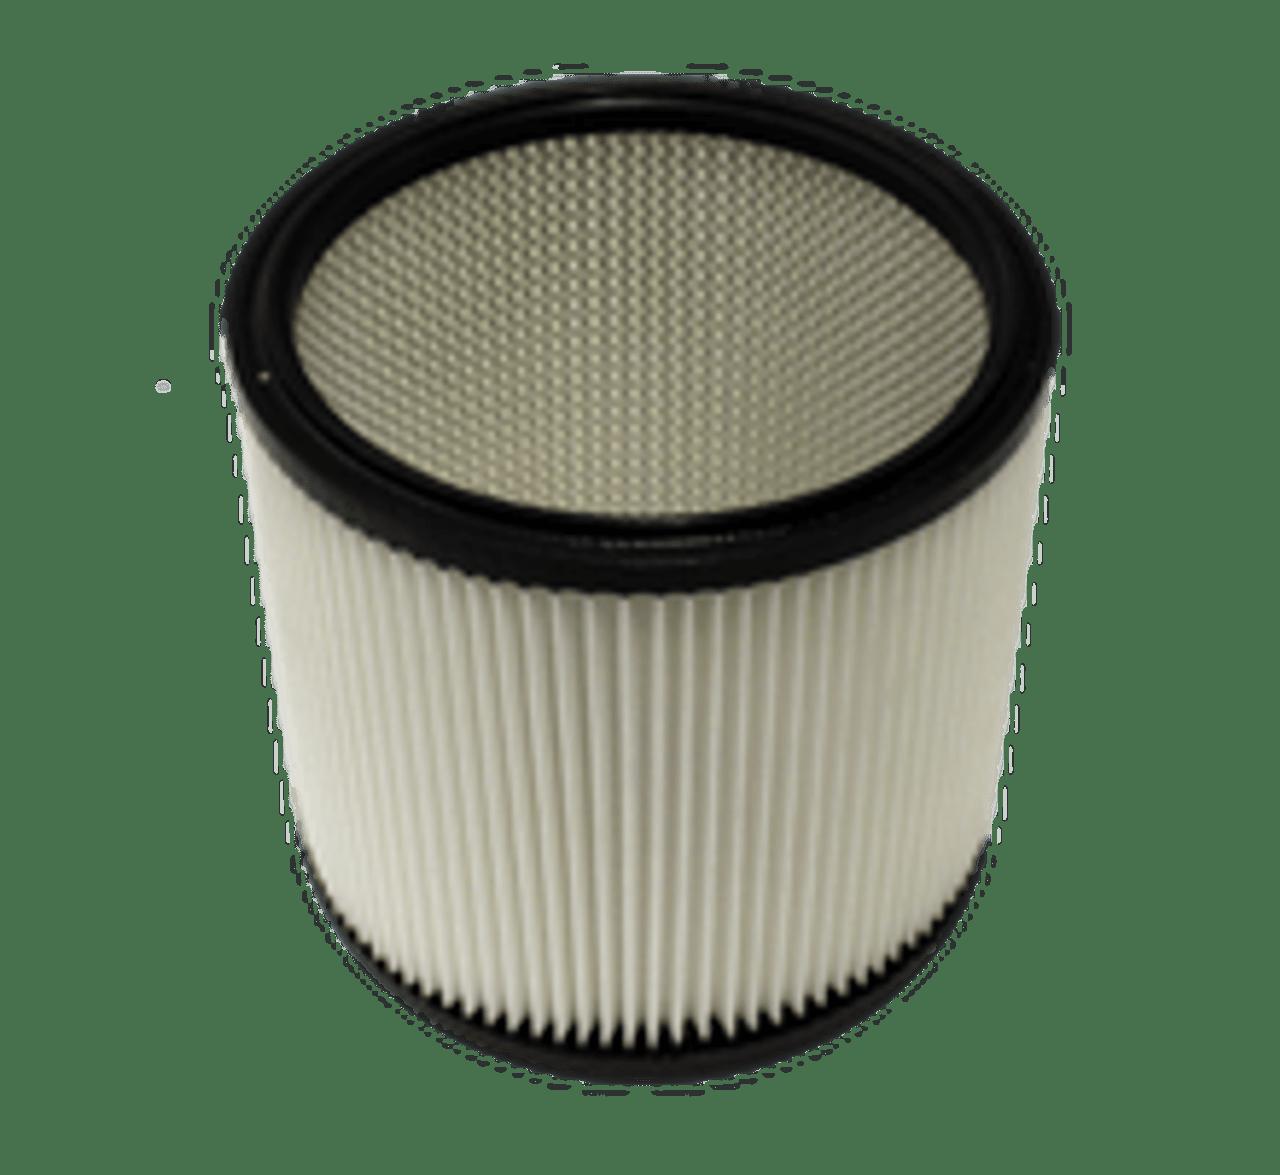 Gutter-Pro Replacement Filter